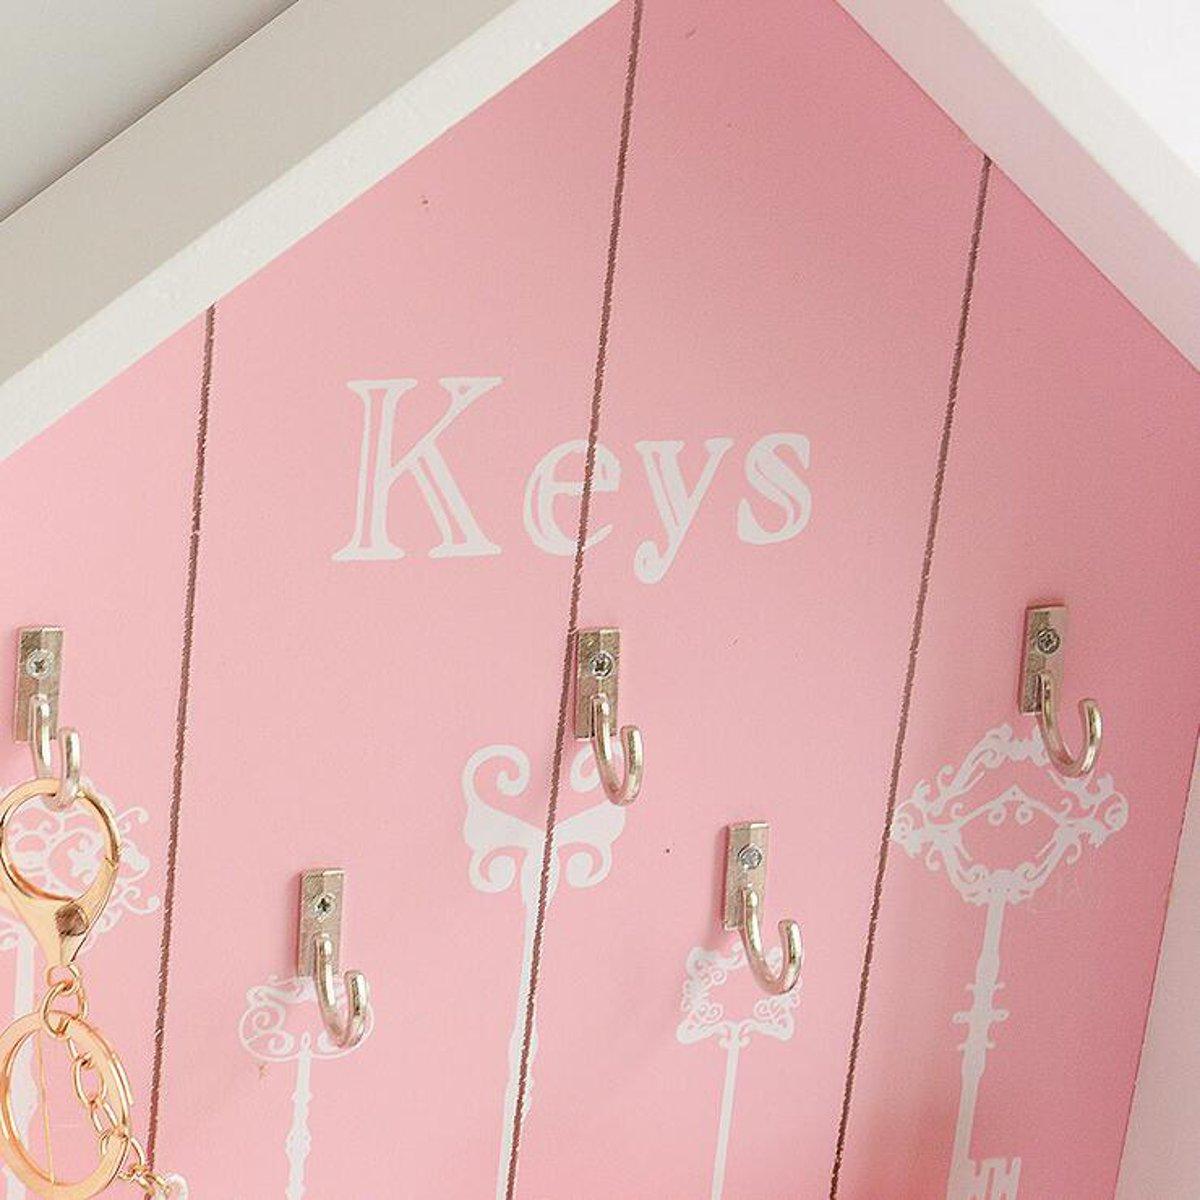 Vintage Parts Storage Box Key Holder Hooks House Hanging  Rack Shabby Chic Wall Mounted Decorations